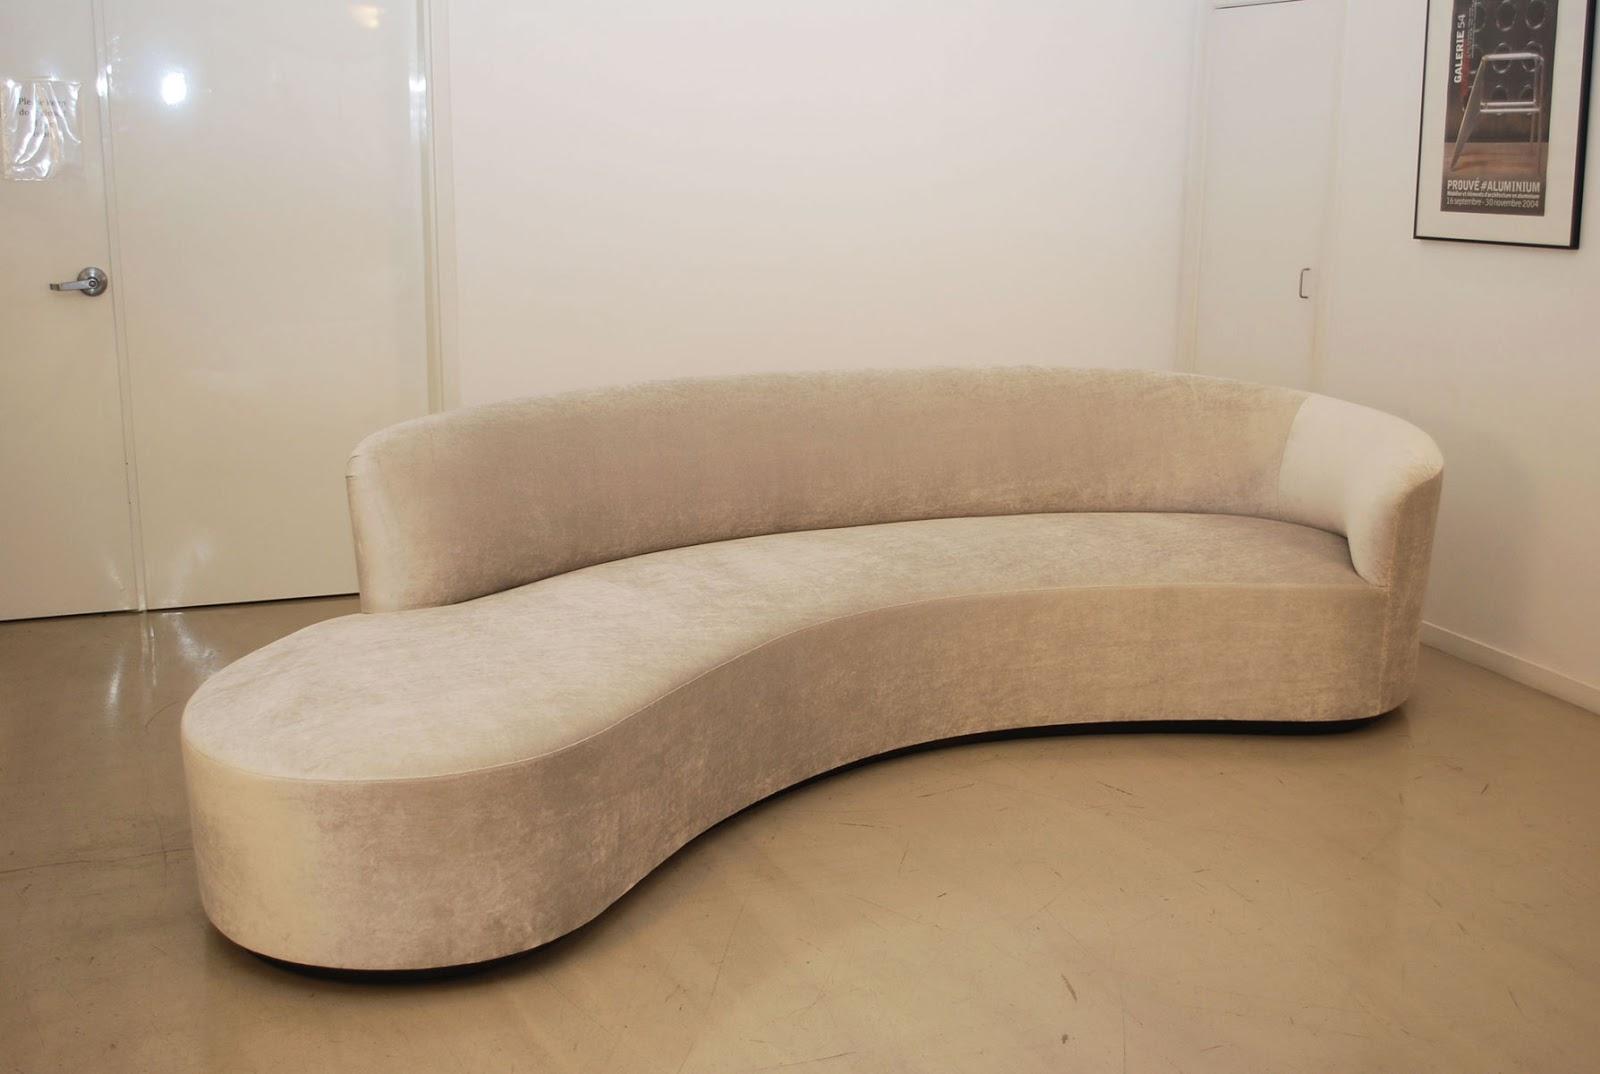 Contemporary Curved Sofa Hereo Sofa Pertaining To Contemporary Curved Sofas (View 8 of 12)